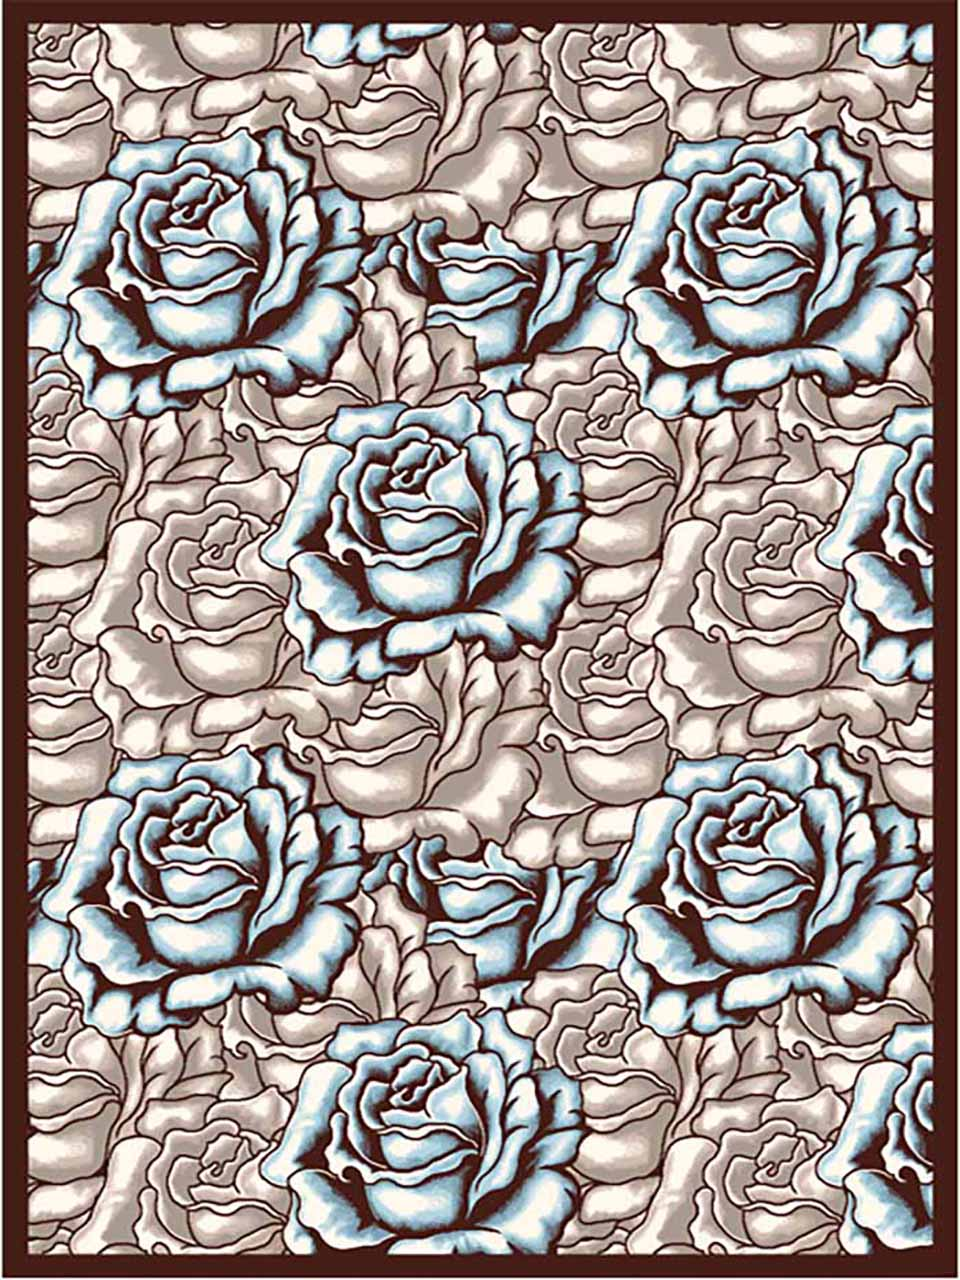 فرش (7010) پلی پرو پیلن - 8 رنگ - 410 شانه - قهوه ای آبی - تراکم 1000